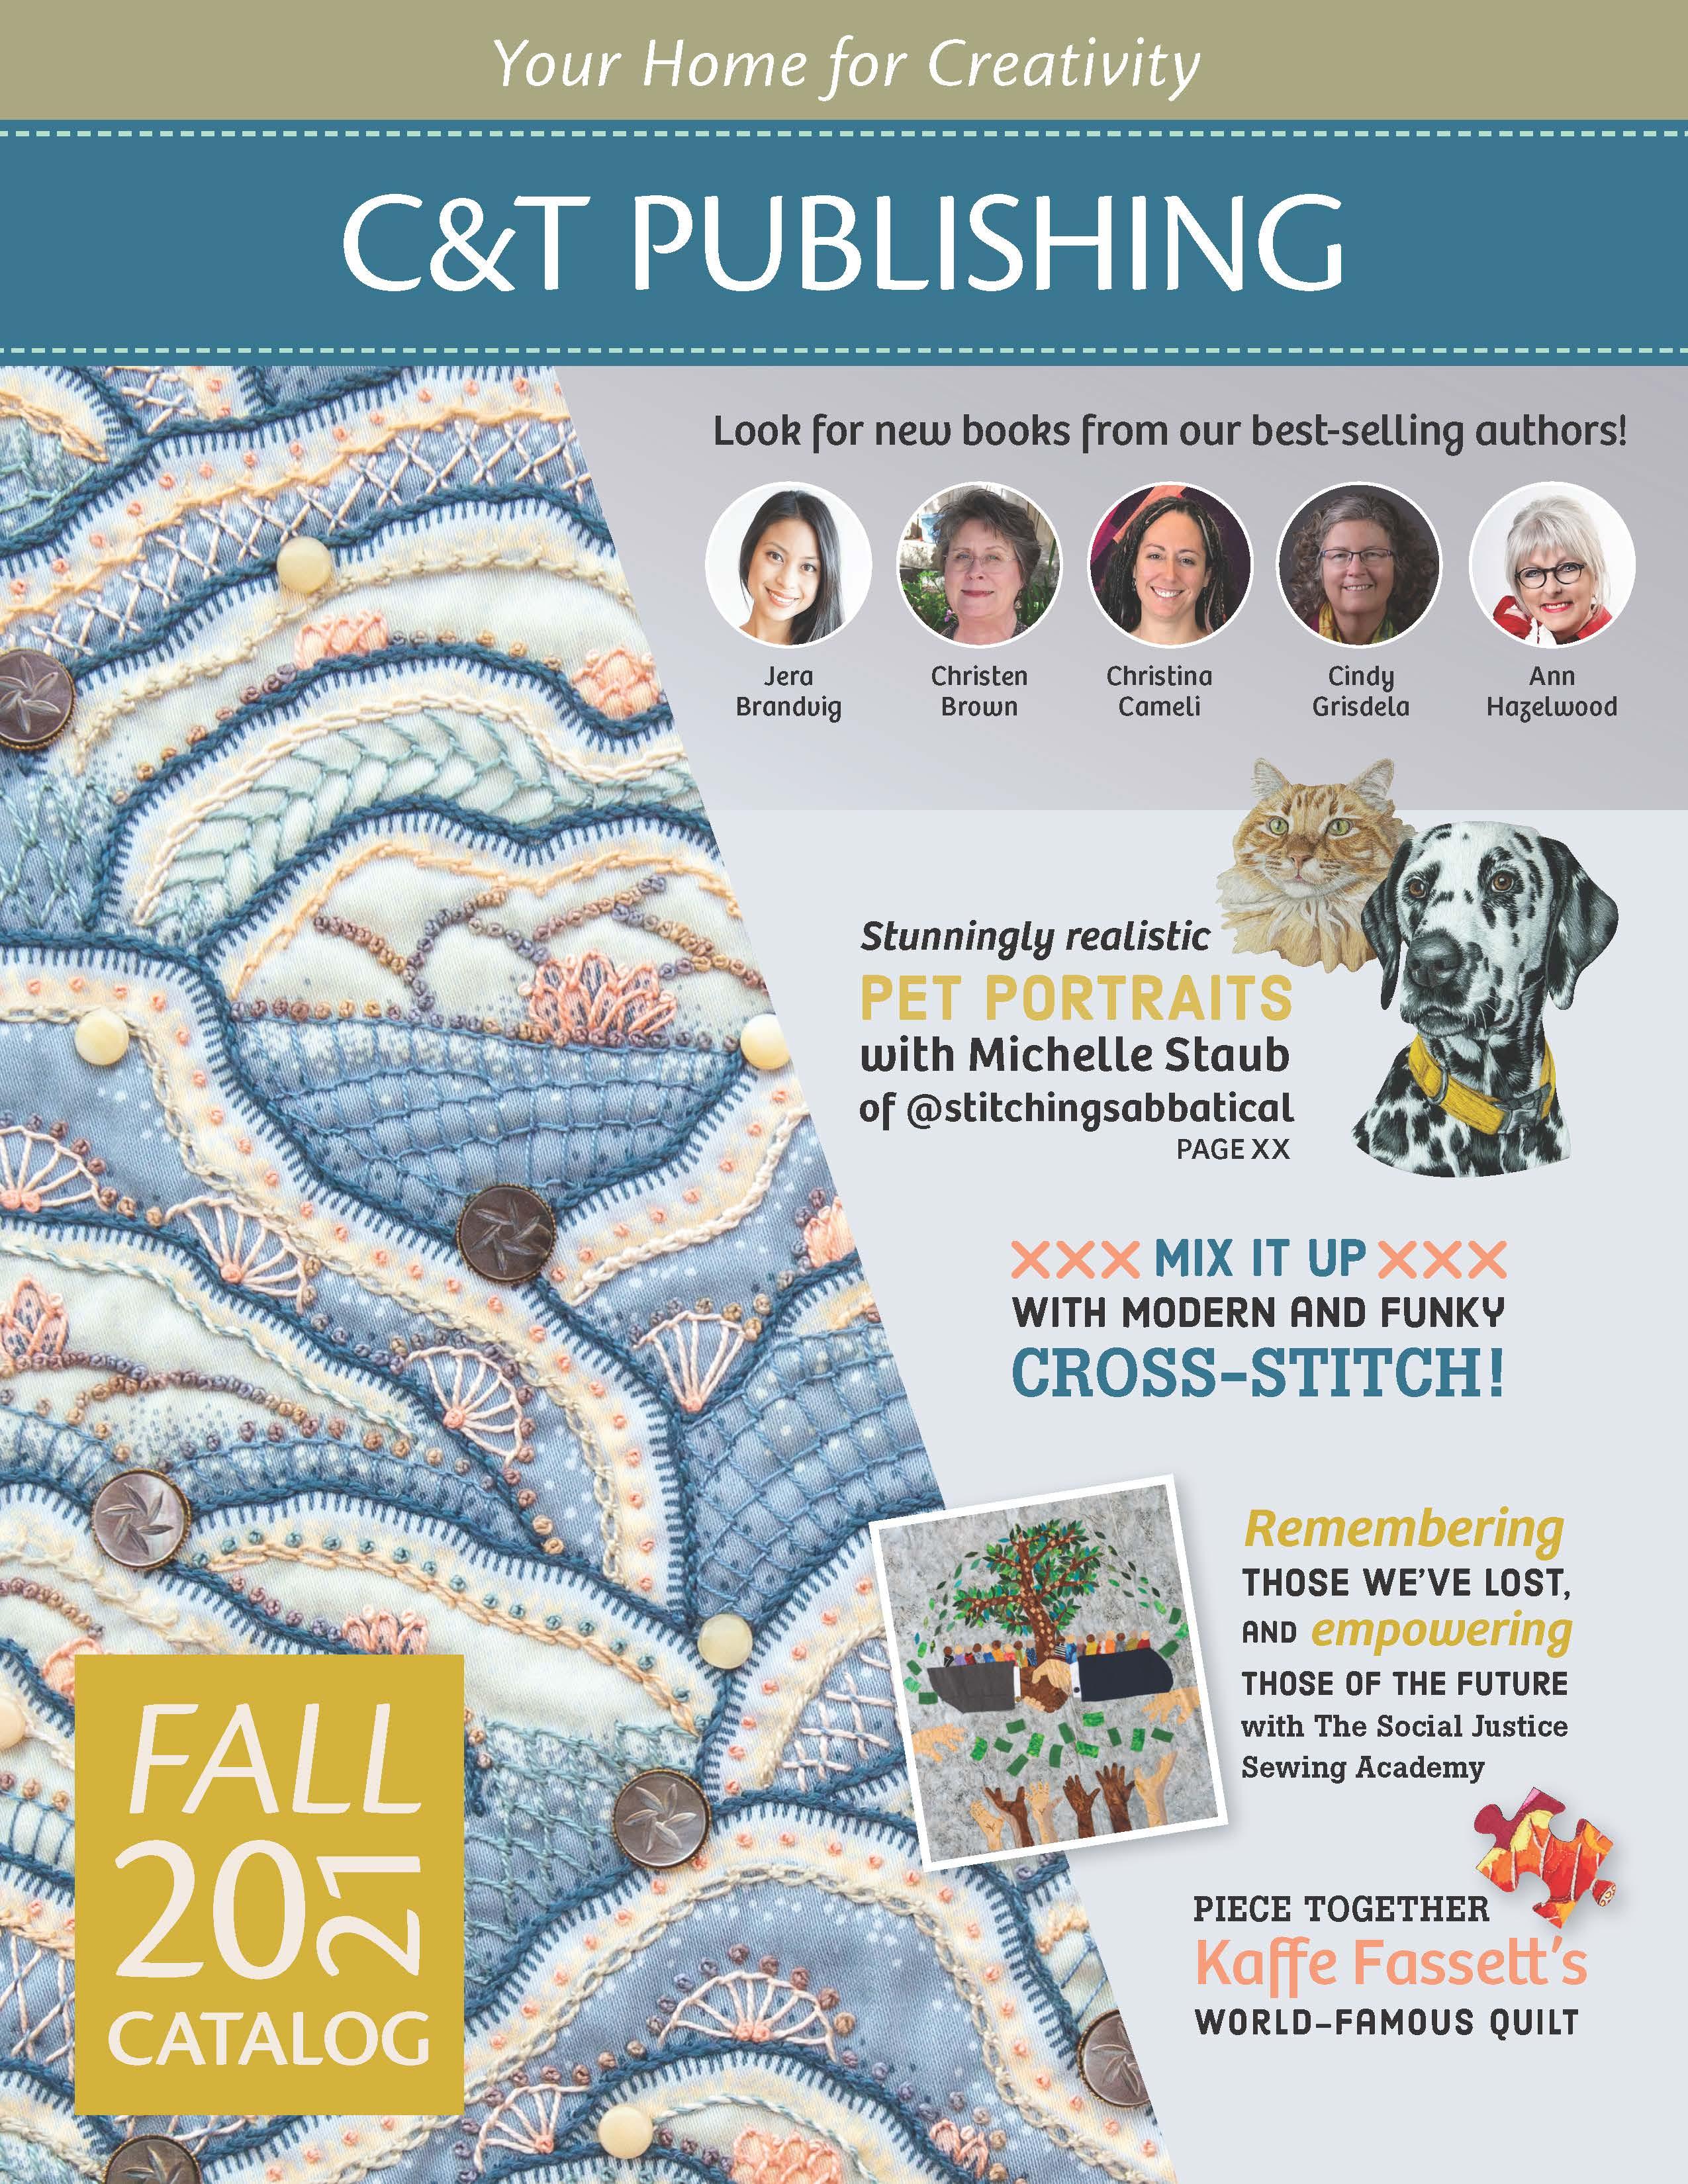 f21-catalog-frontcover.jpg